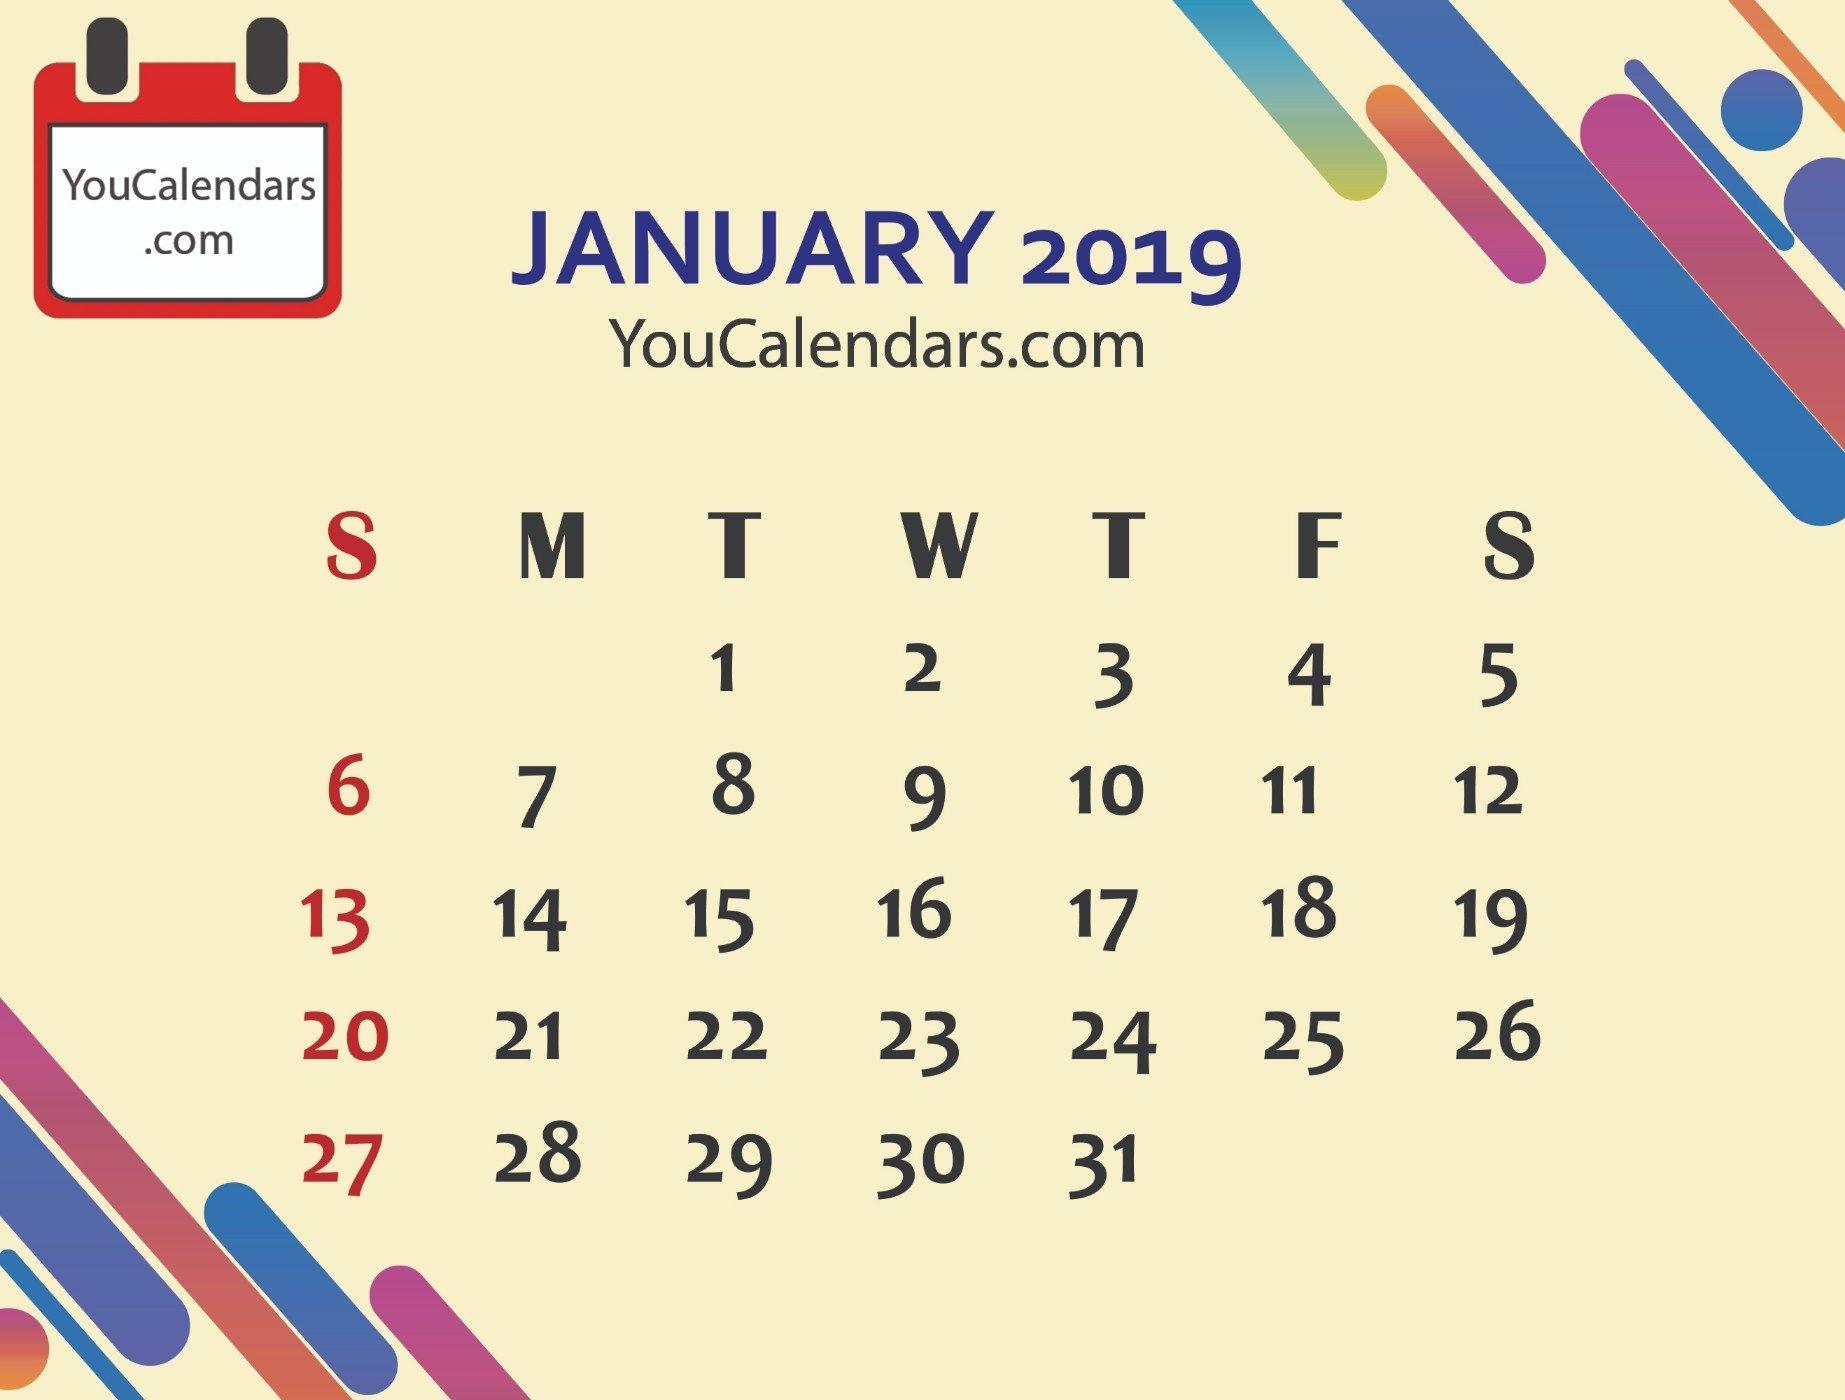 Free January 2019 Calendar Printable Template - You Calendars January 8 2019 Calendar